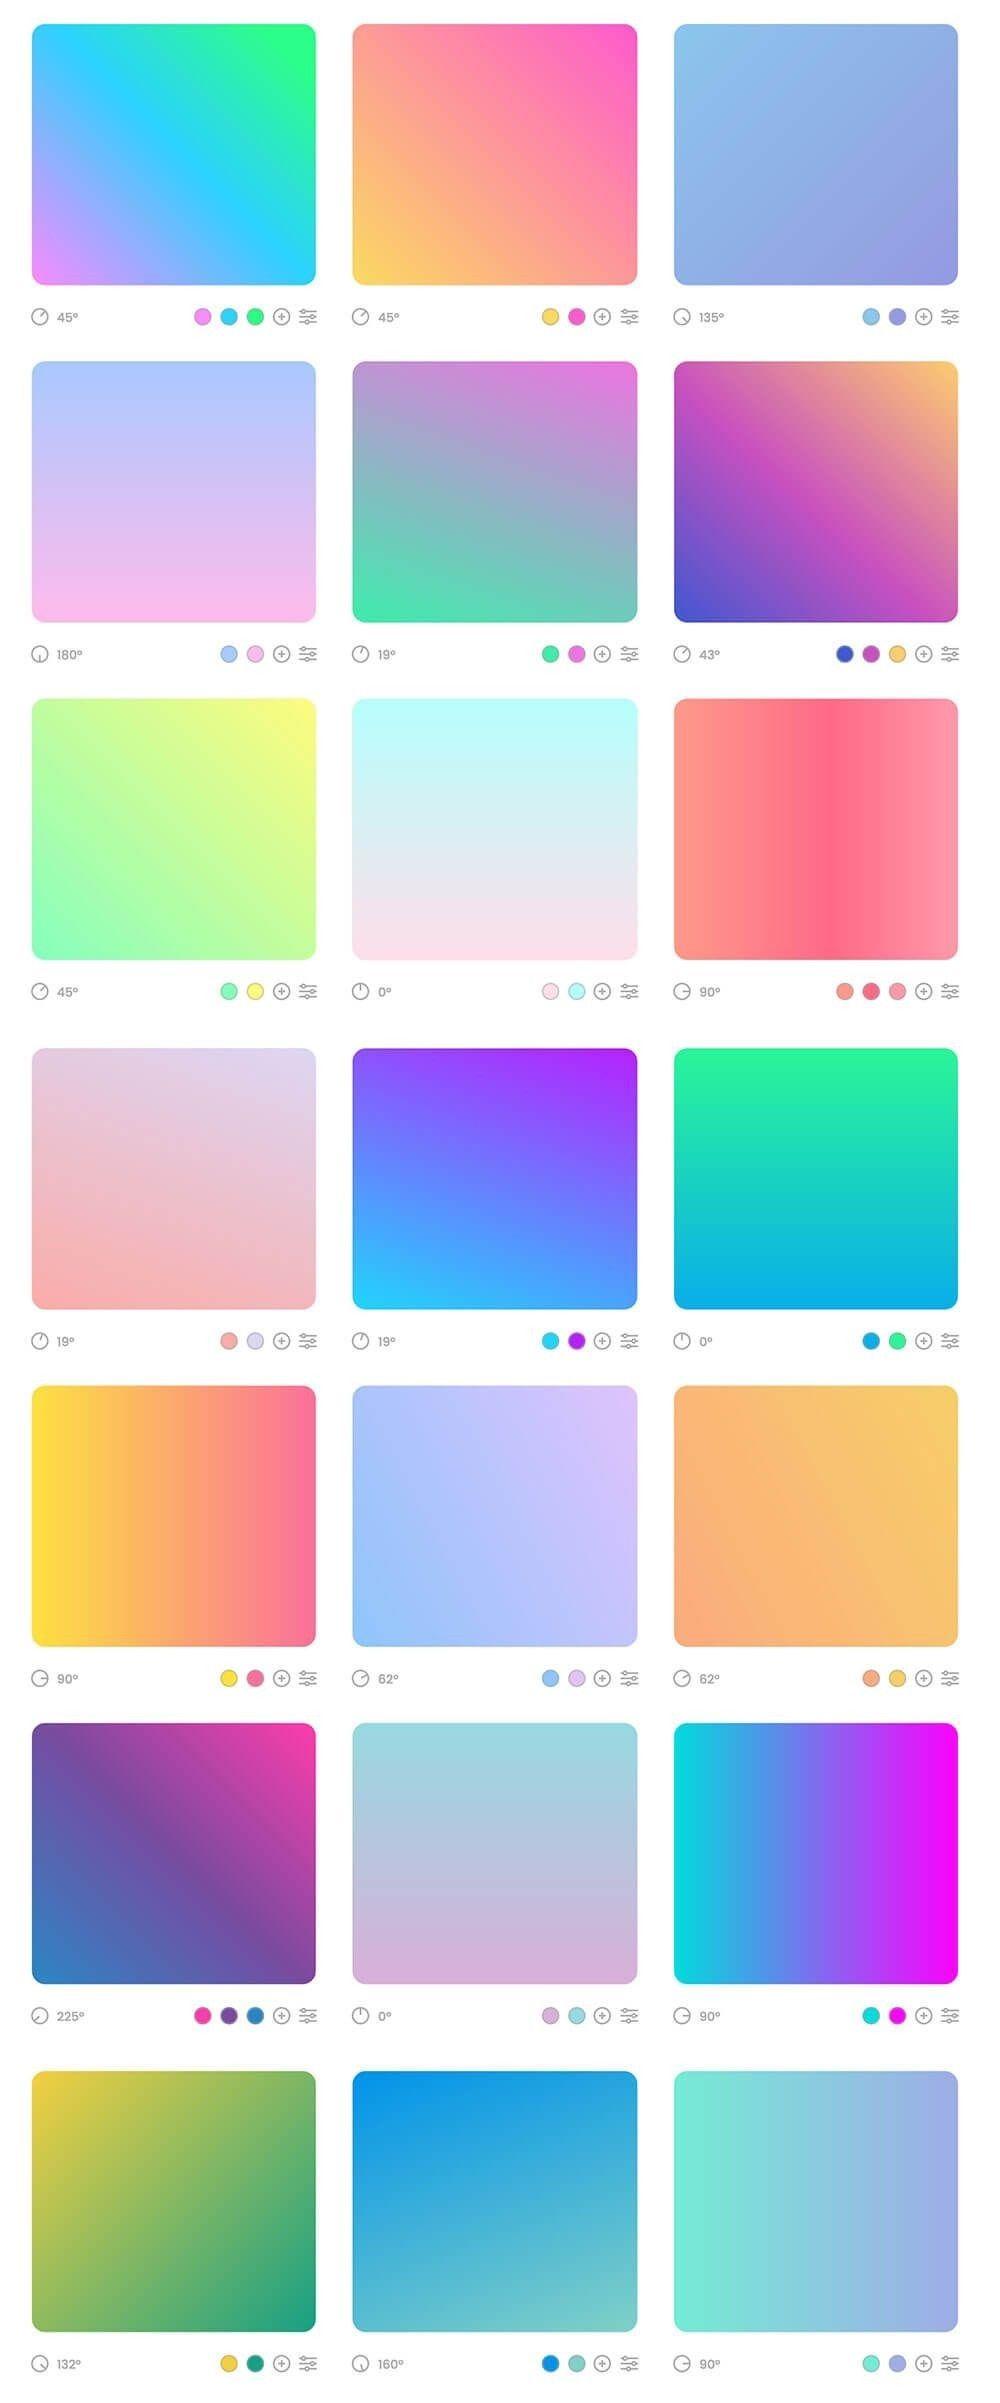 54775e38dc3a8f7764b3af61a21acfb6 Jpg 565 800 Pixels Color Theory Color Psychology Graphic Design Tips